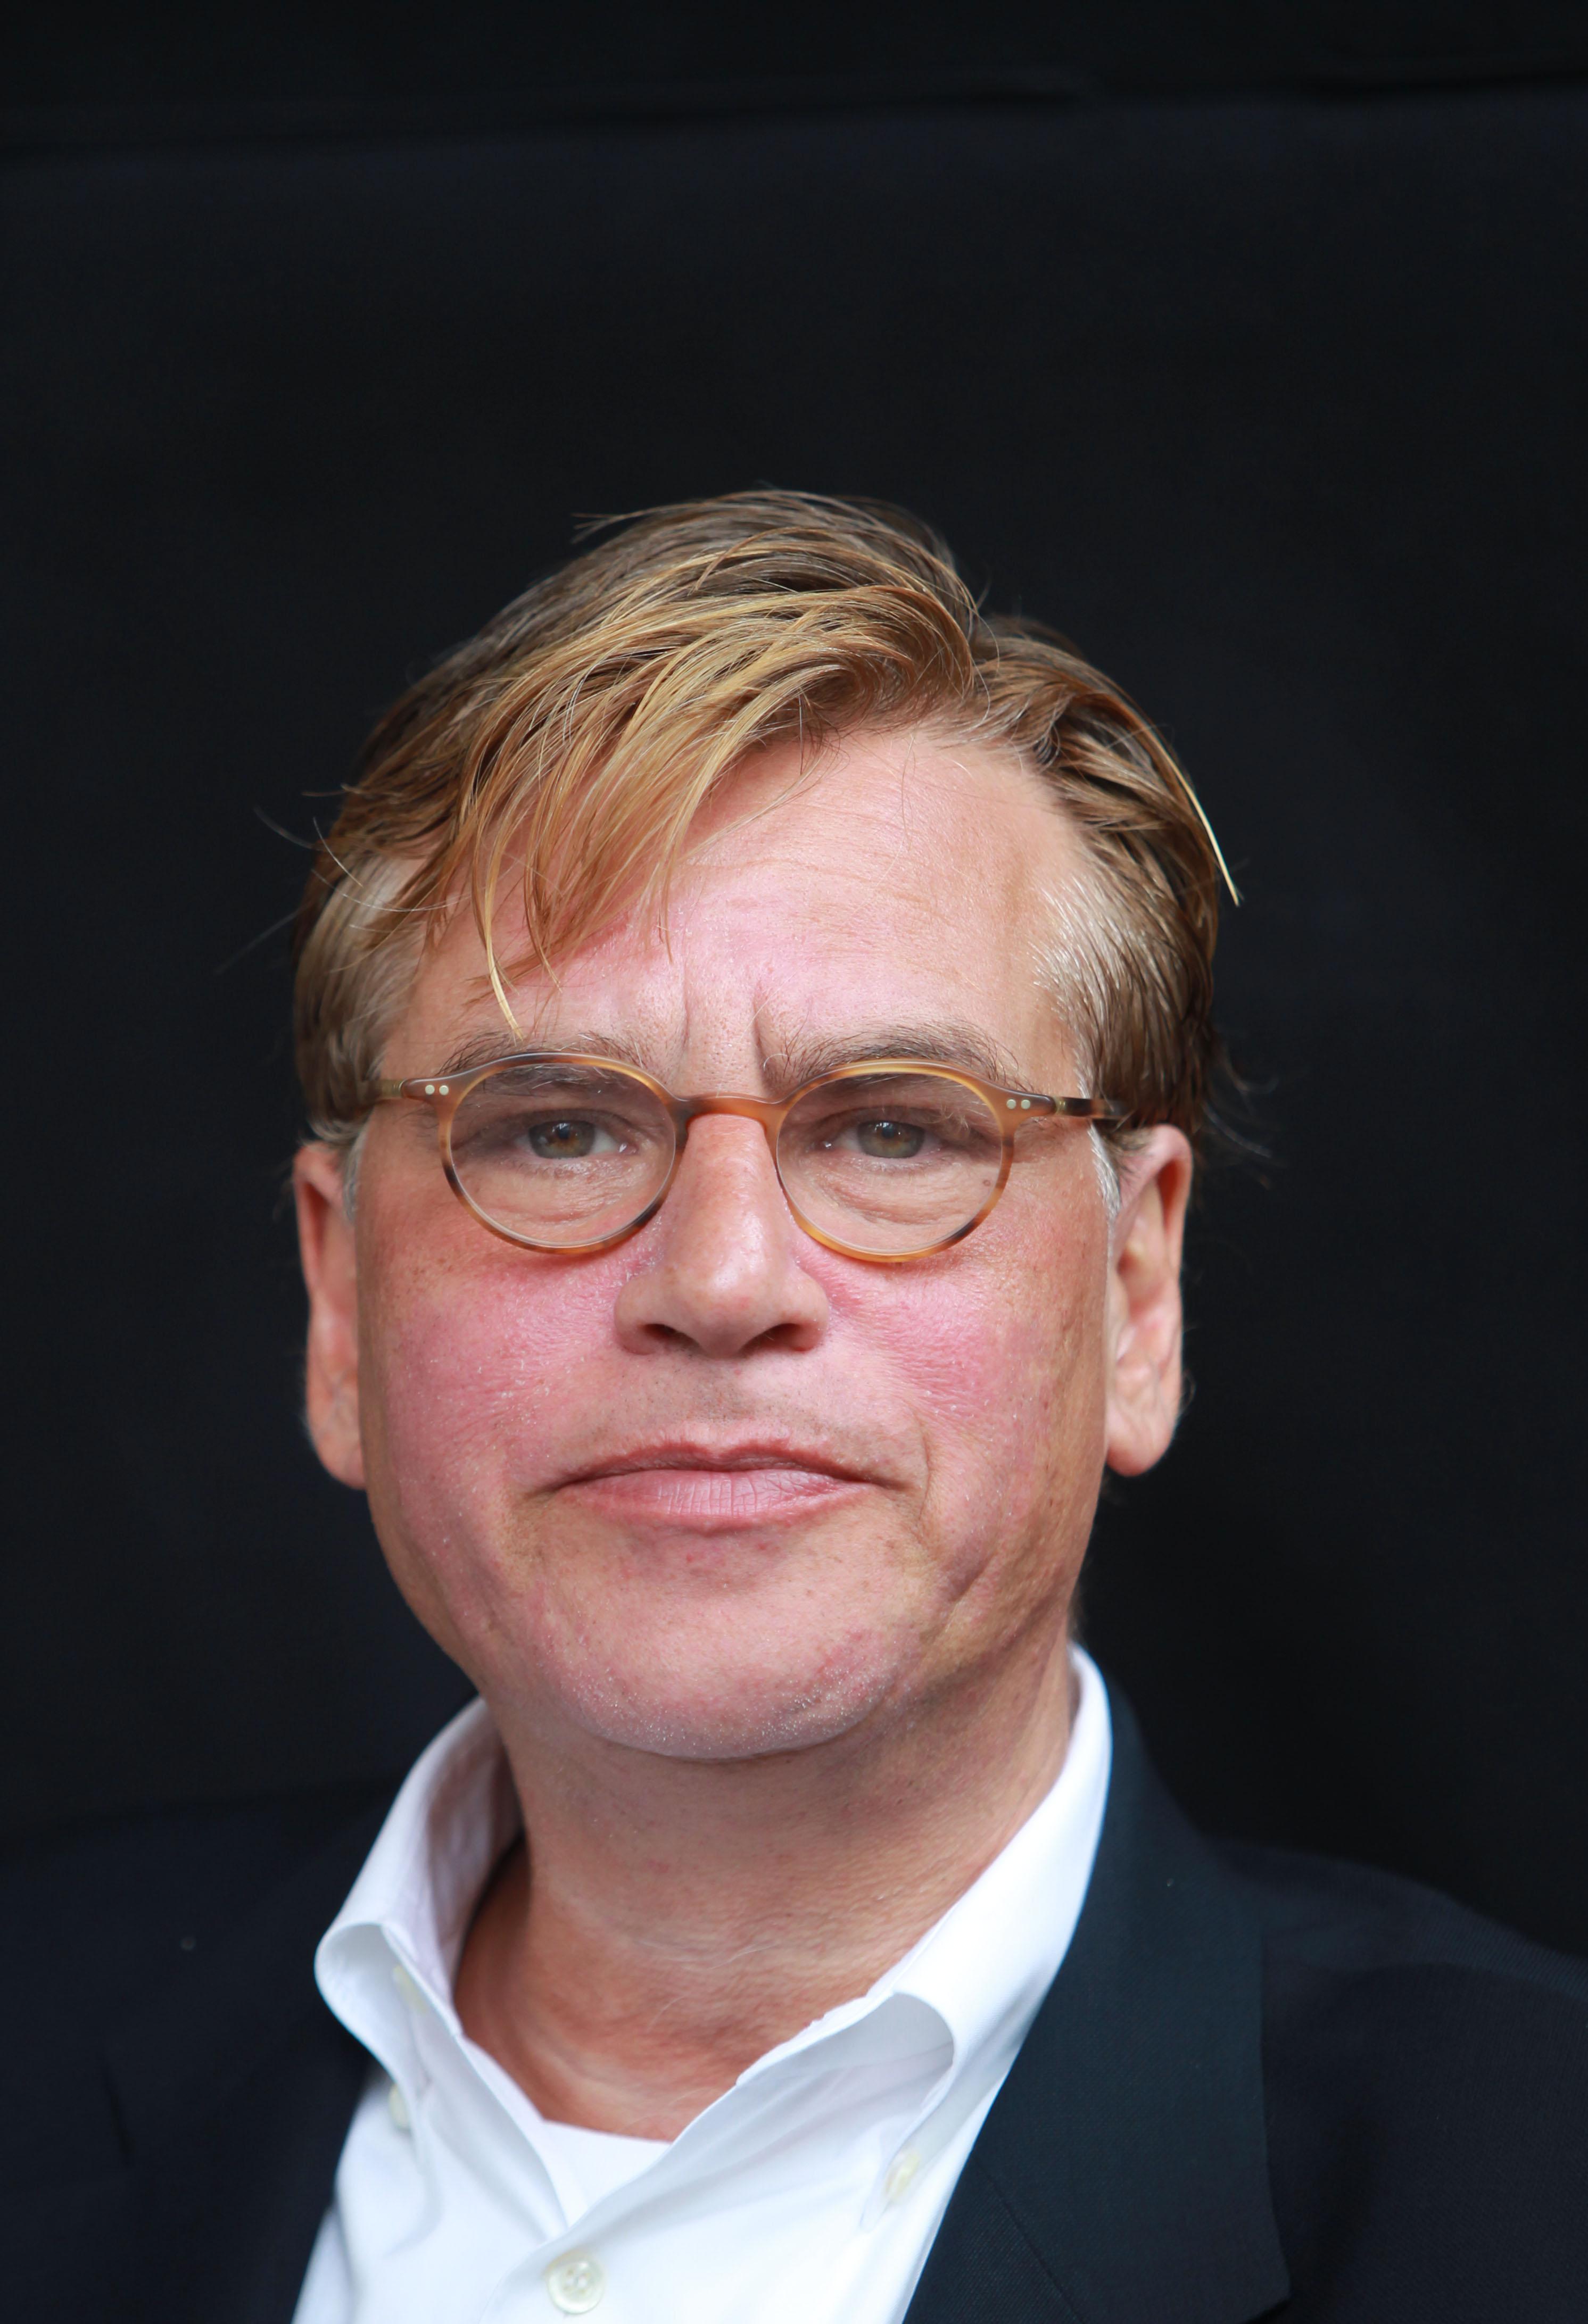 Aaron Sorkin filming  Newsroom  on July 20, 2014 in New York City.